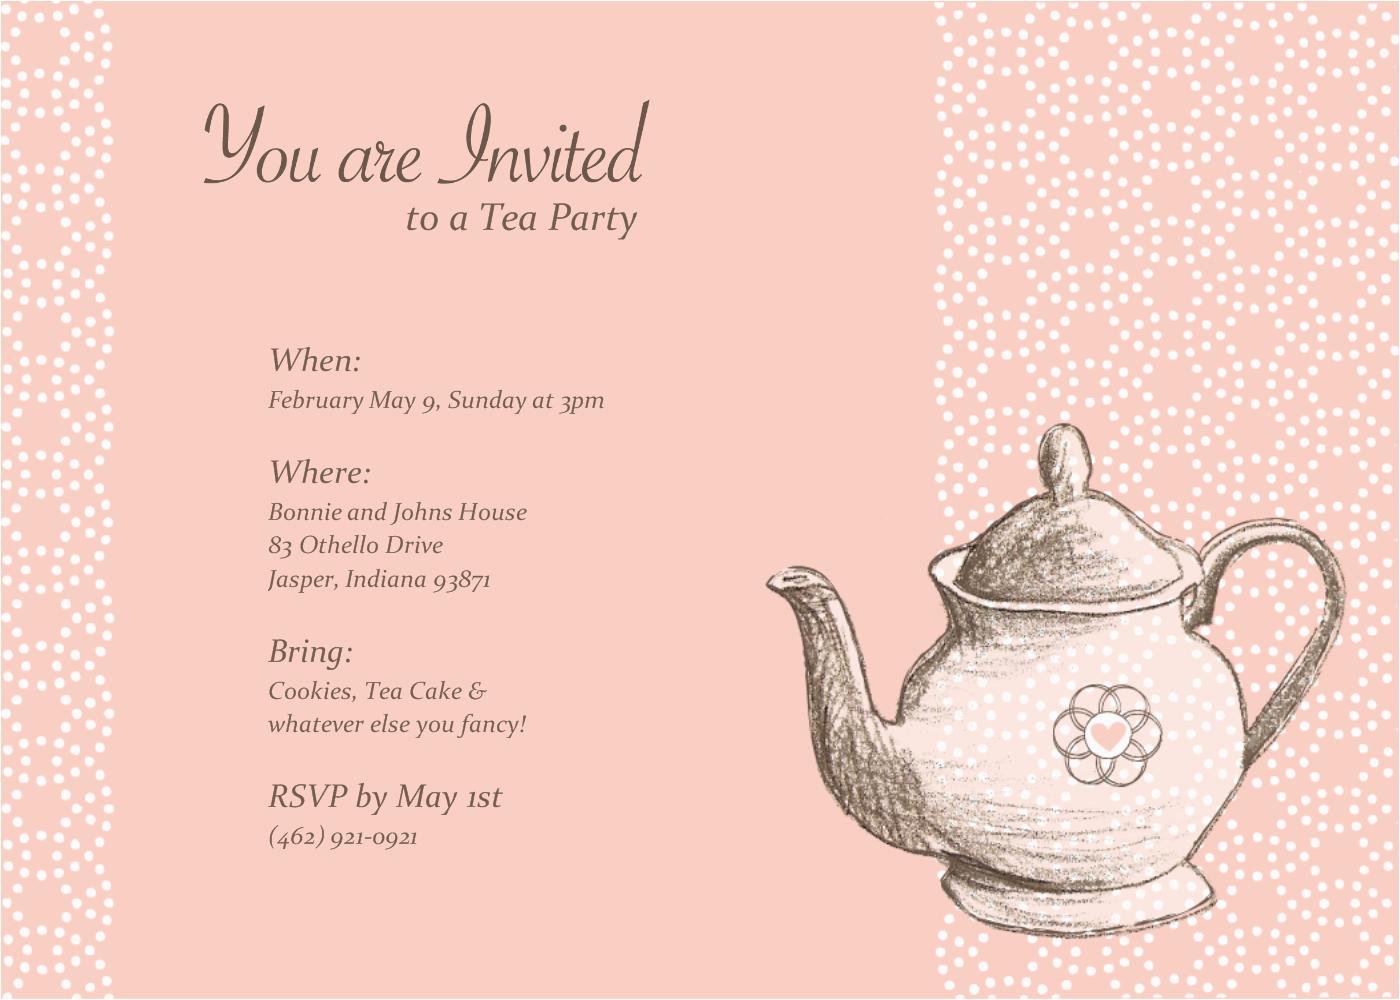 teapot invitations template